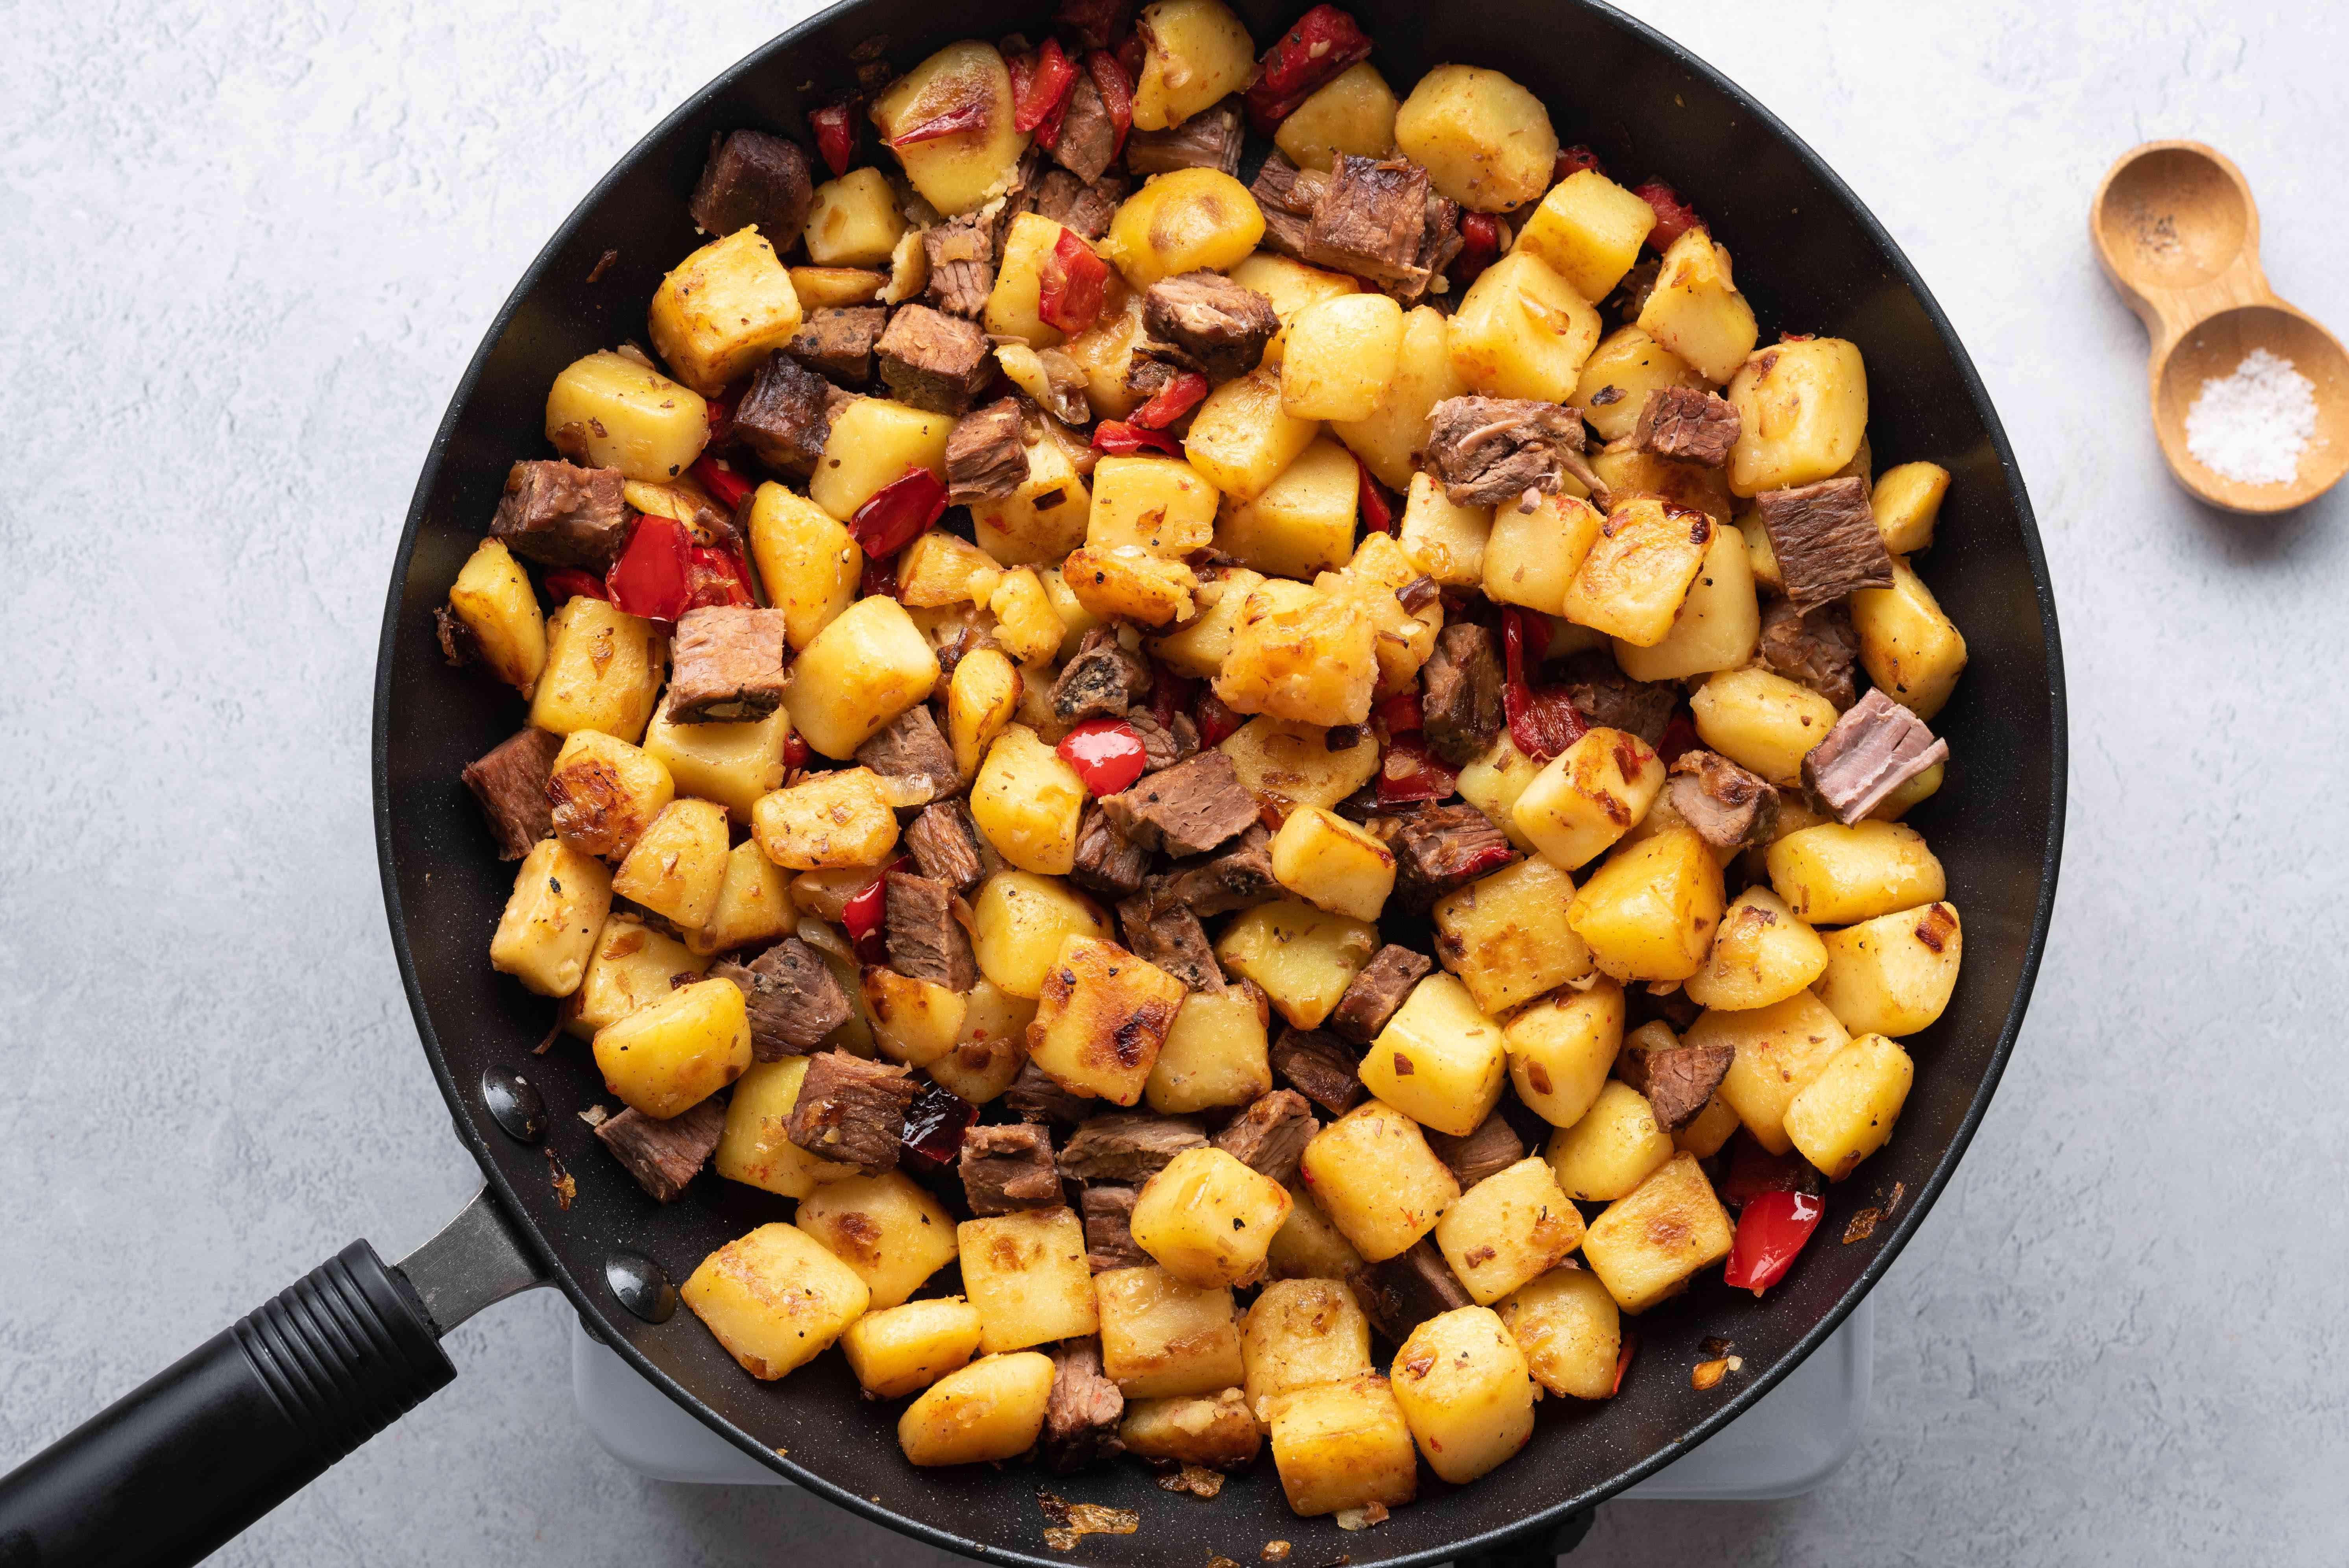 brisket hash cooking in the pan